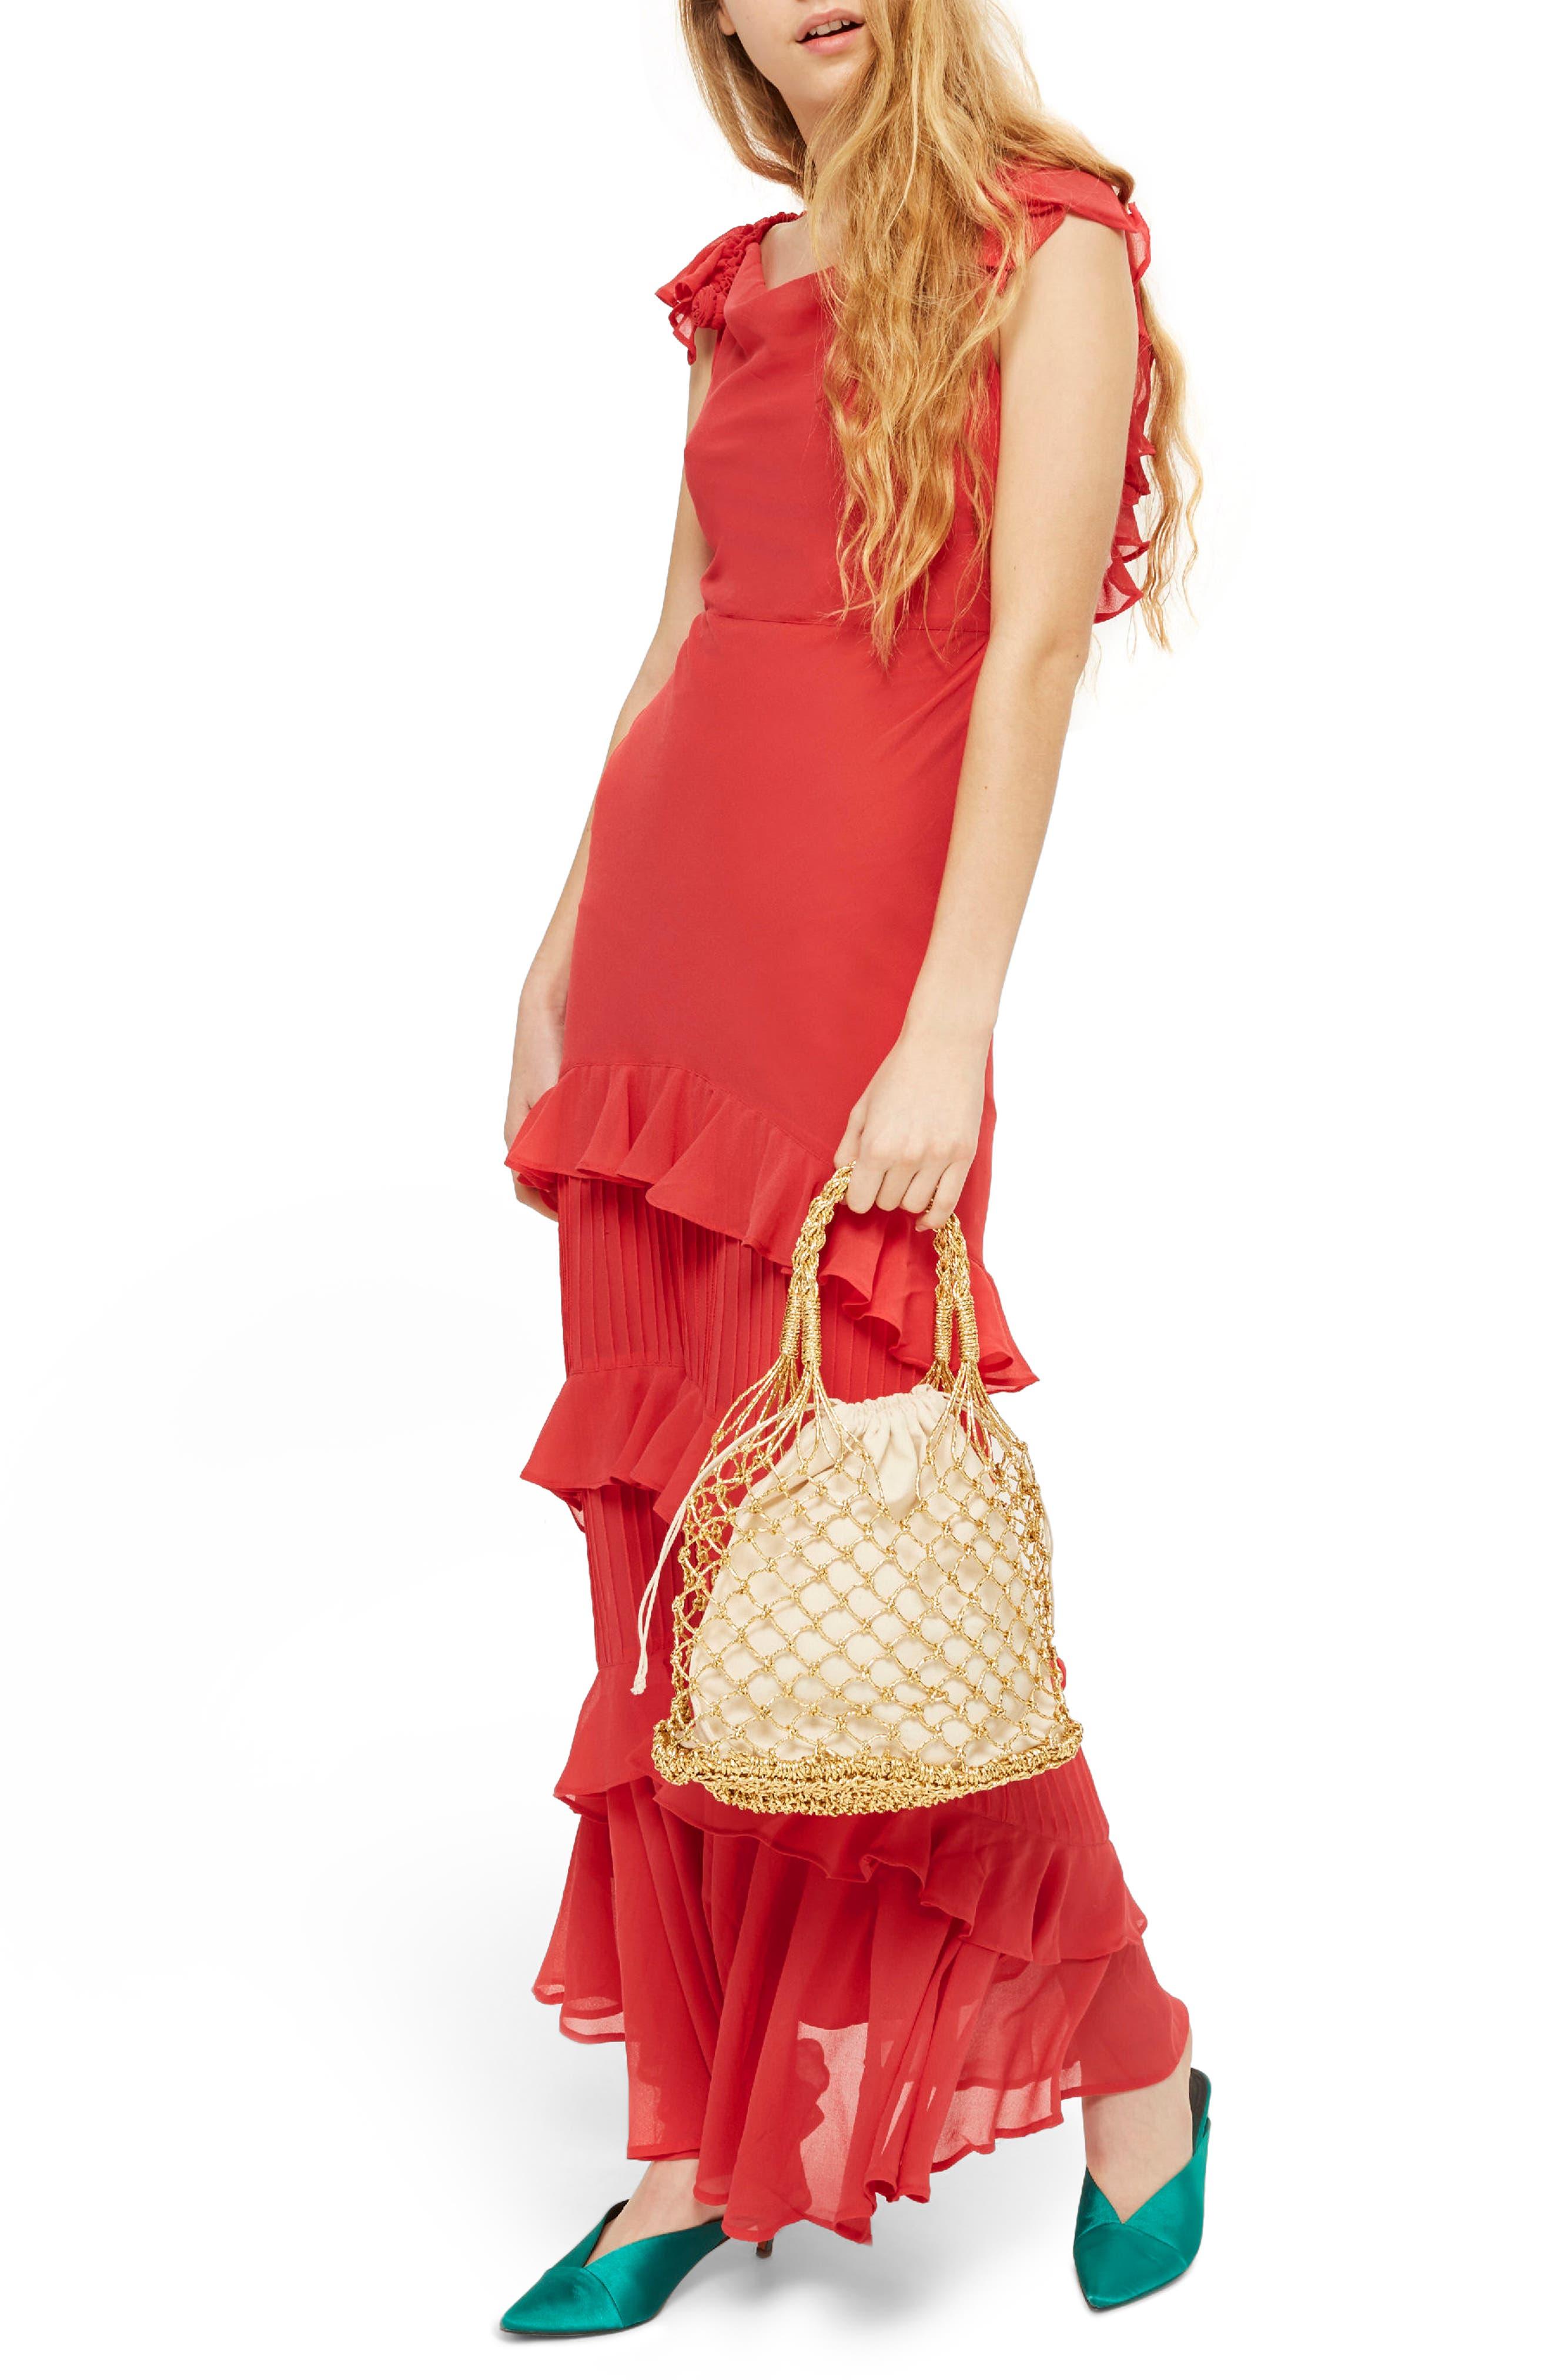 Topshop Ruffle Maxi Dress